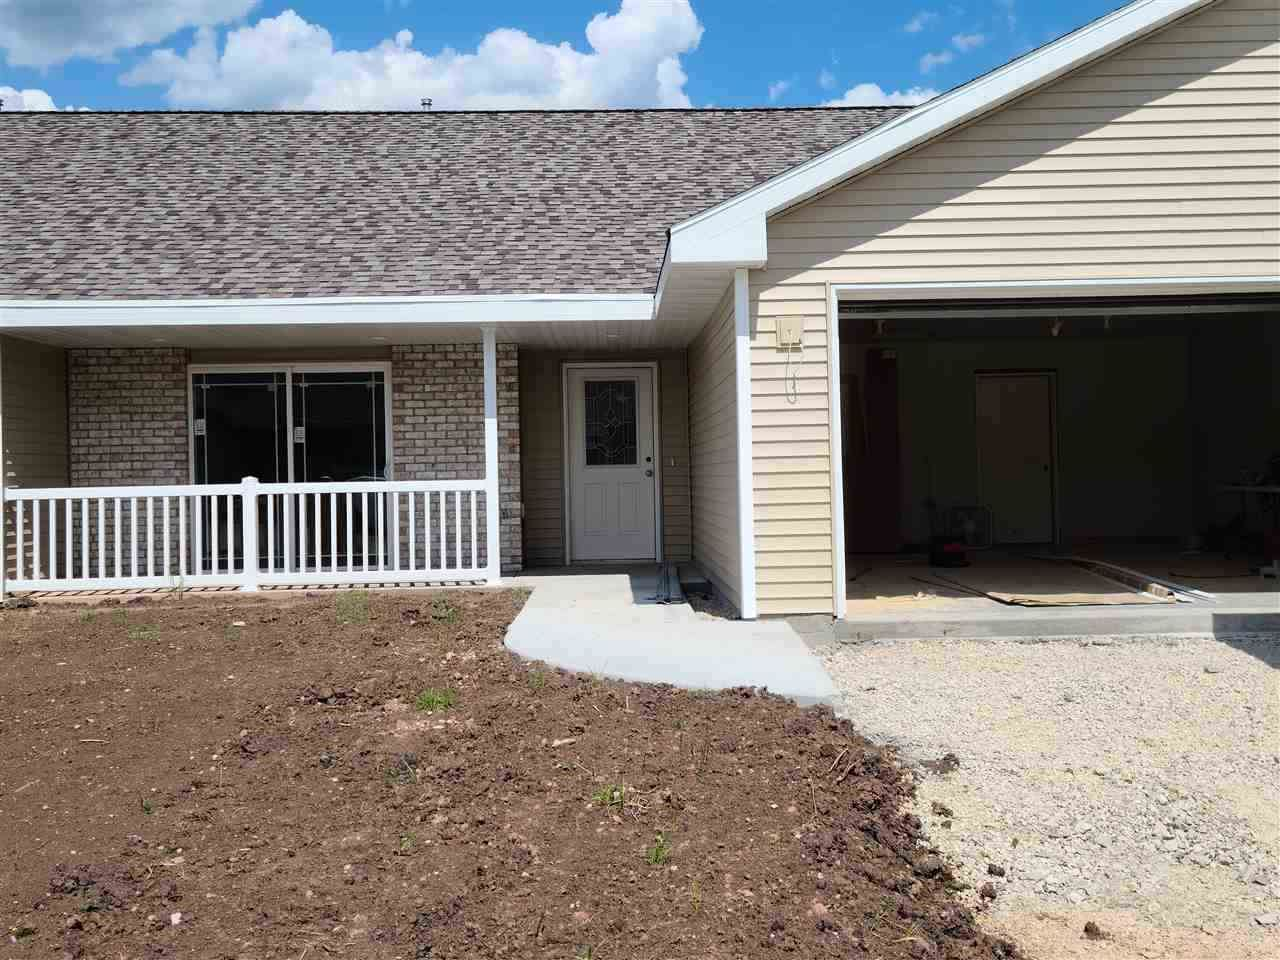 131 STONE CASTLE Drive, Fond du Lac, WI 54935 - MLS#: 50235193